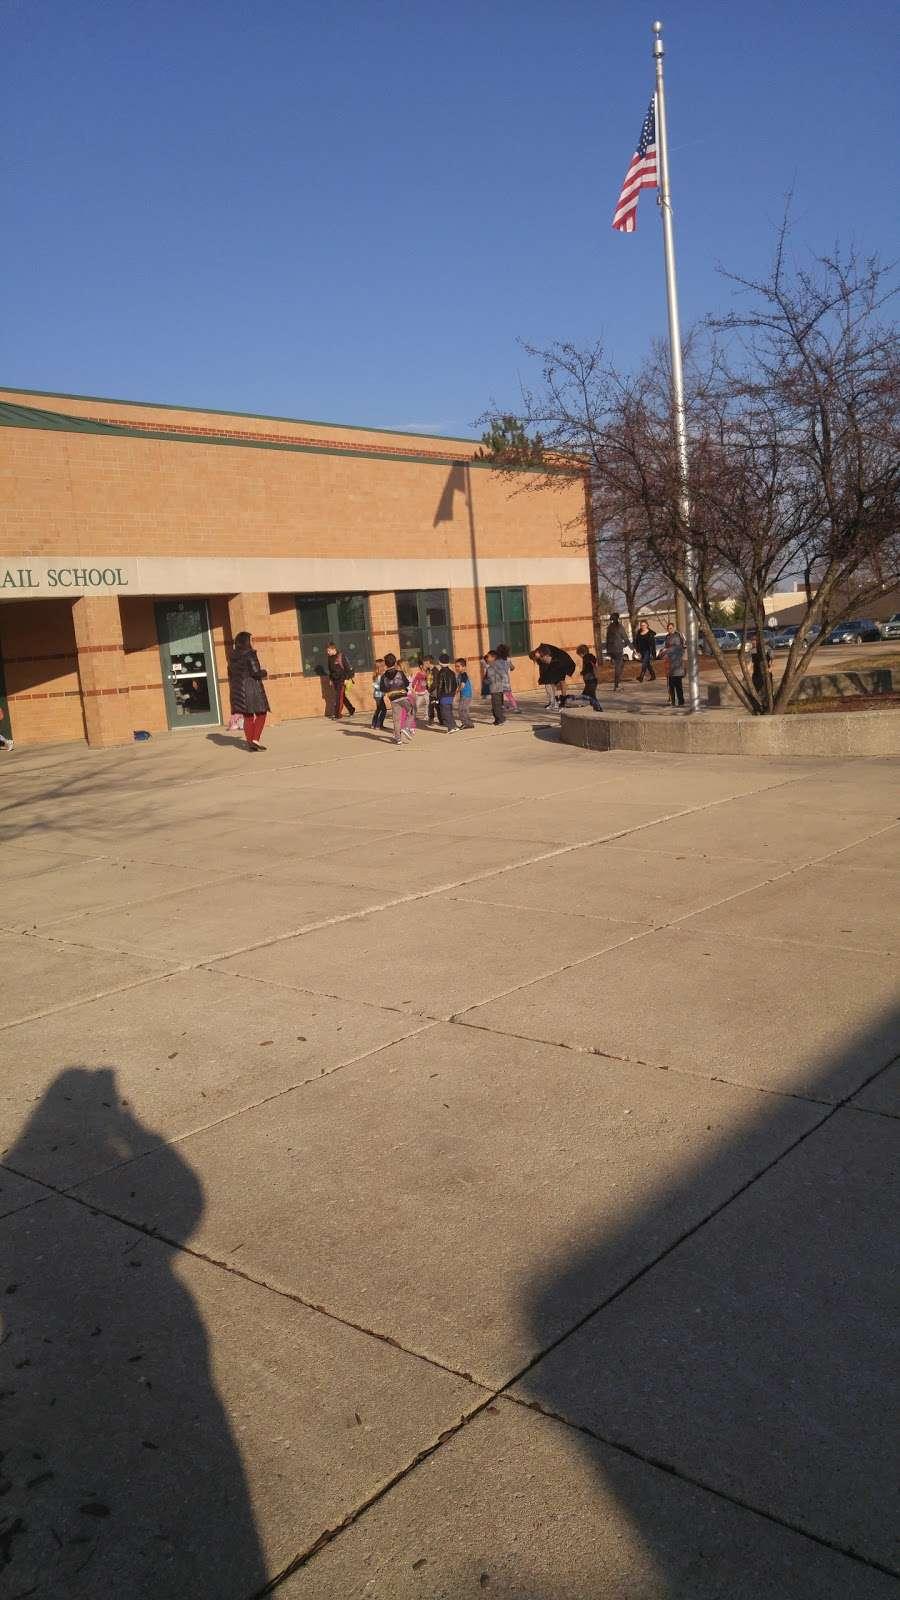 Spring Trail Elementary School - school  | Photo 1 of 1 | Address: 1384 Spring Valley Dr, Carol Stream, IL 60188, USA | Phone: (630) 213-6230